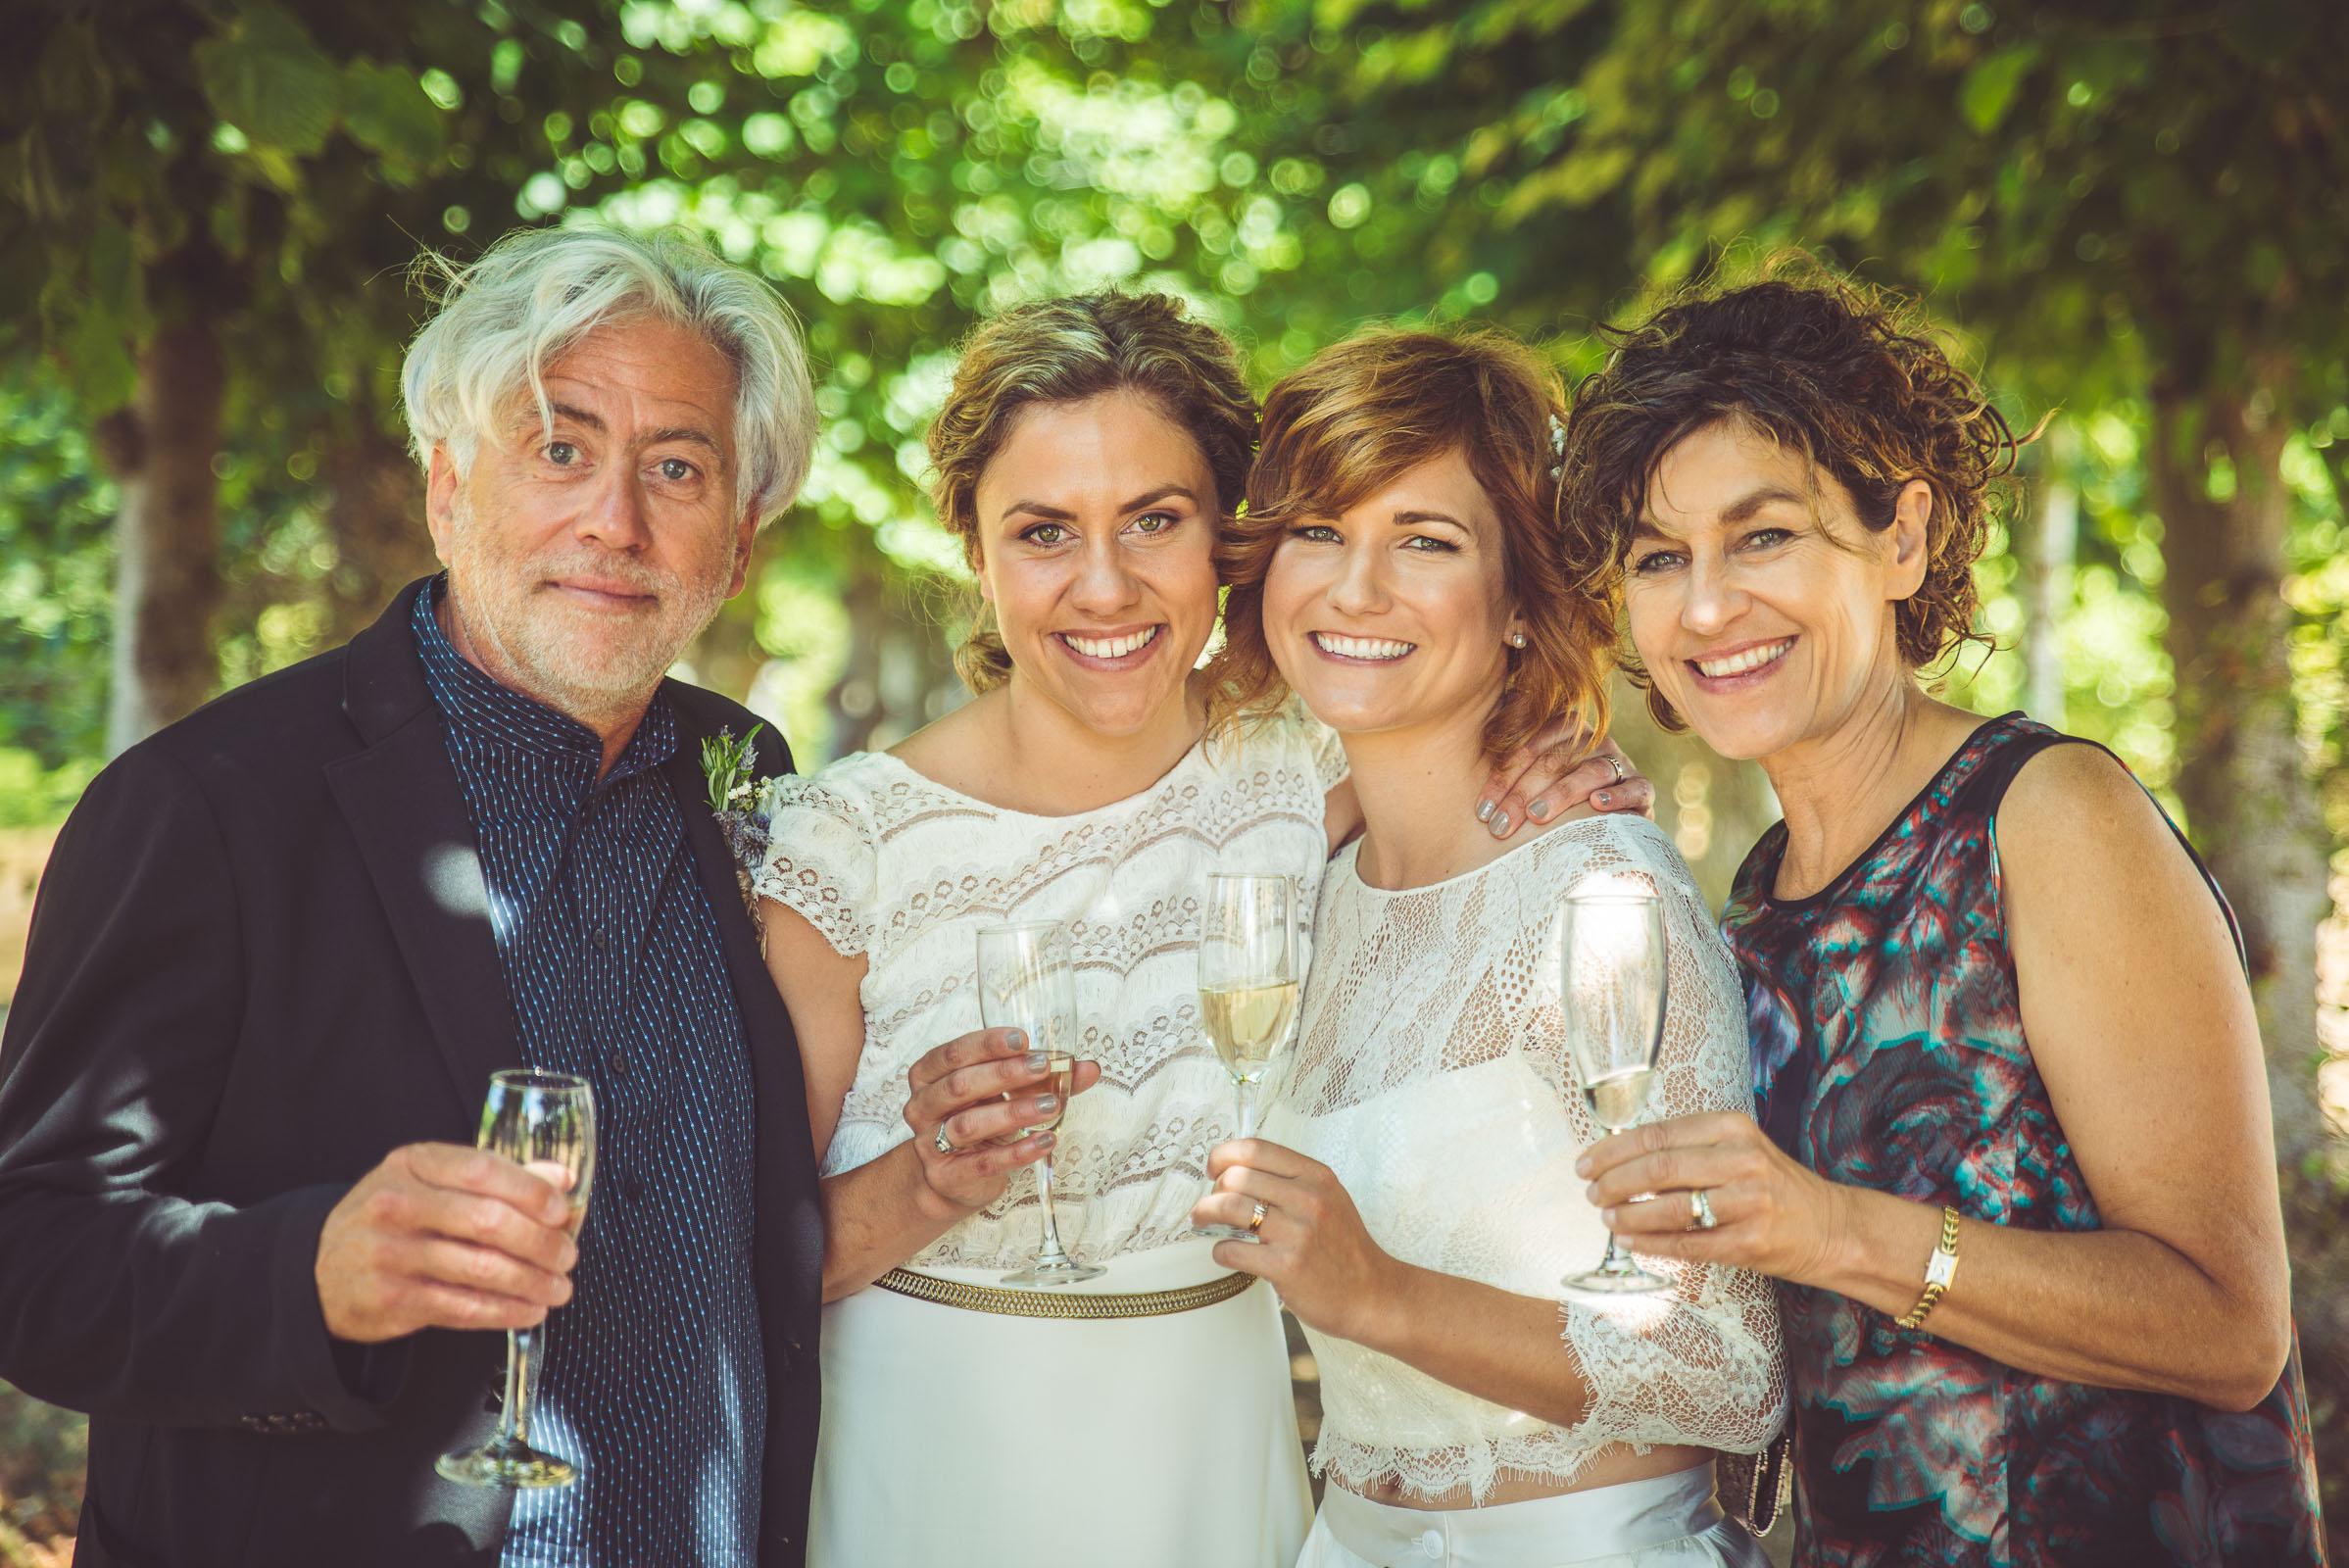 Hitchin_wedding_St_Pauls_Waldenbury_Royston_Wedding_Photographer-20.jpg